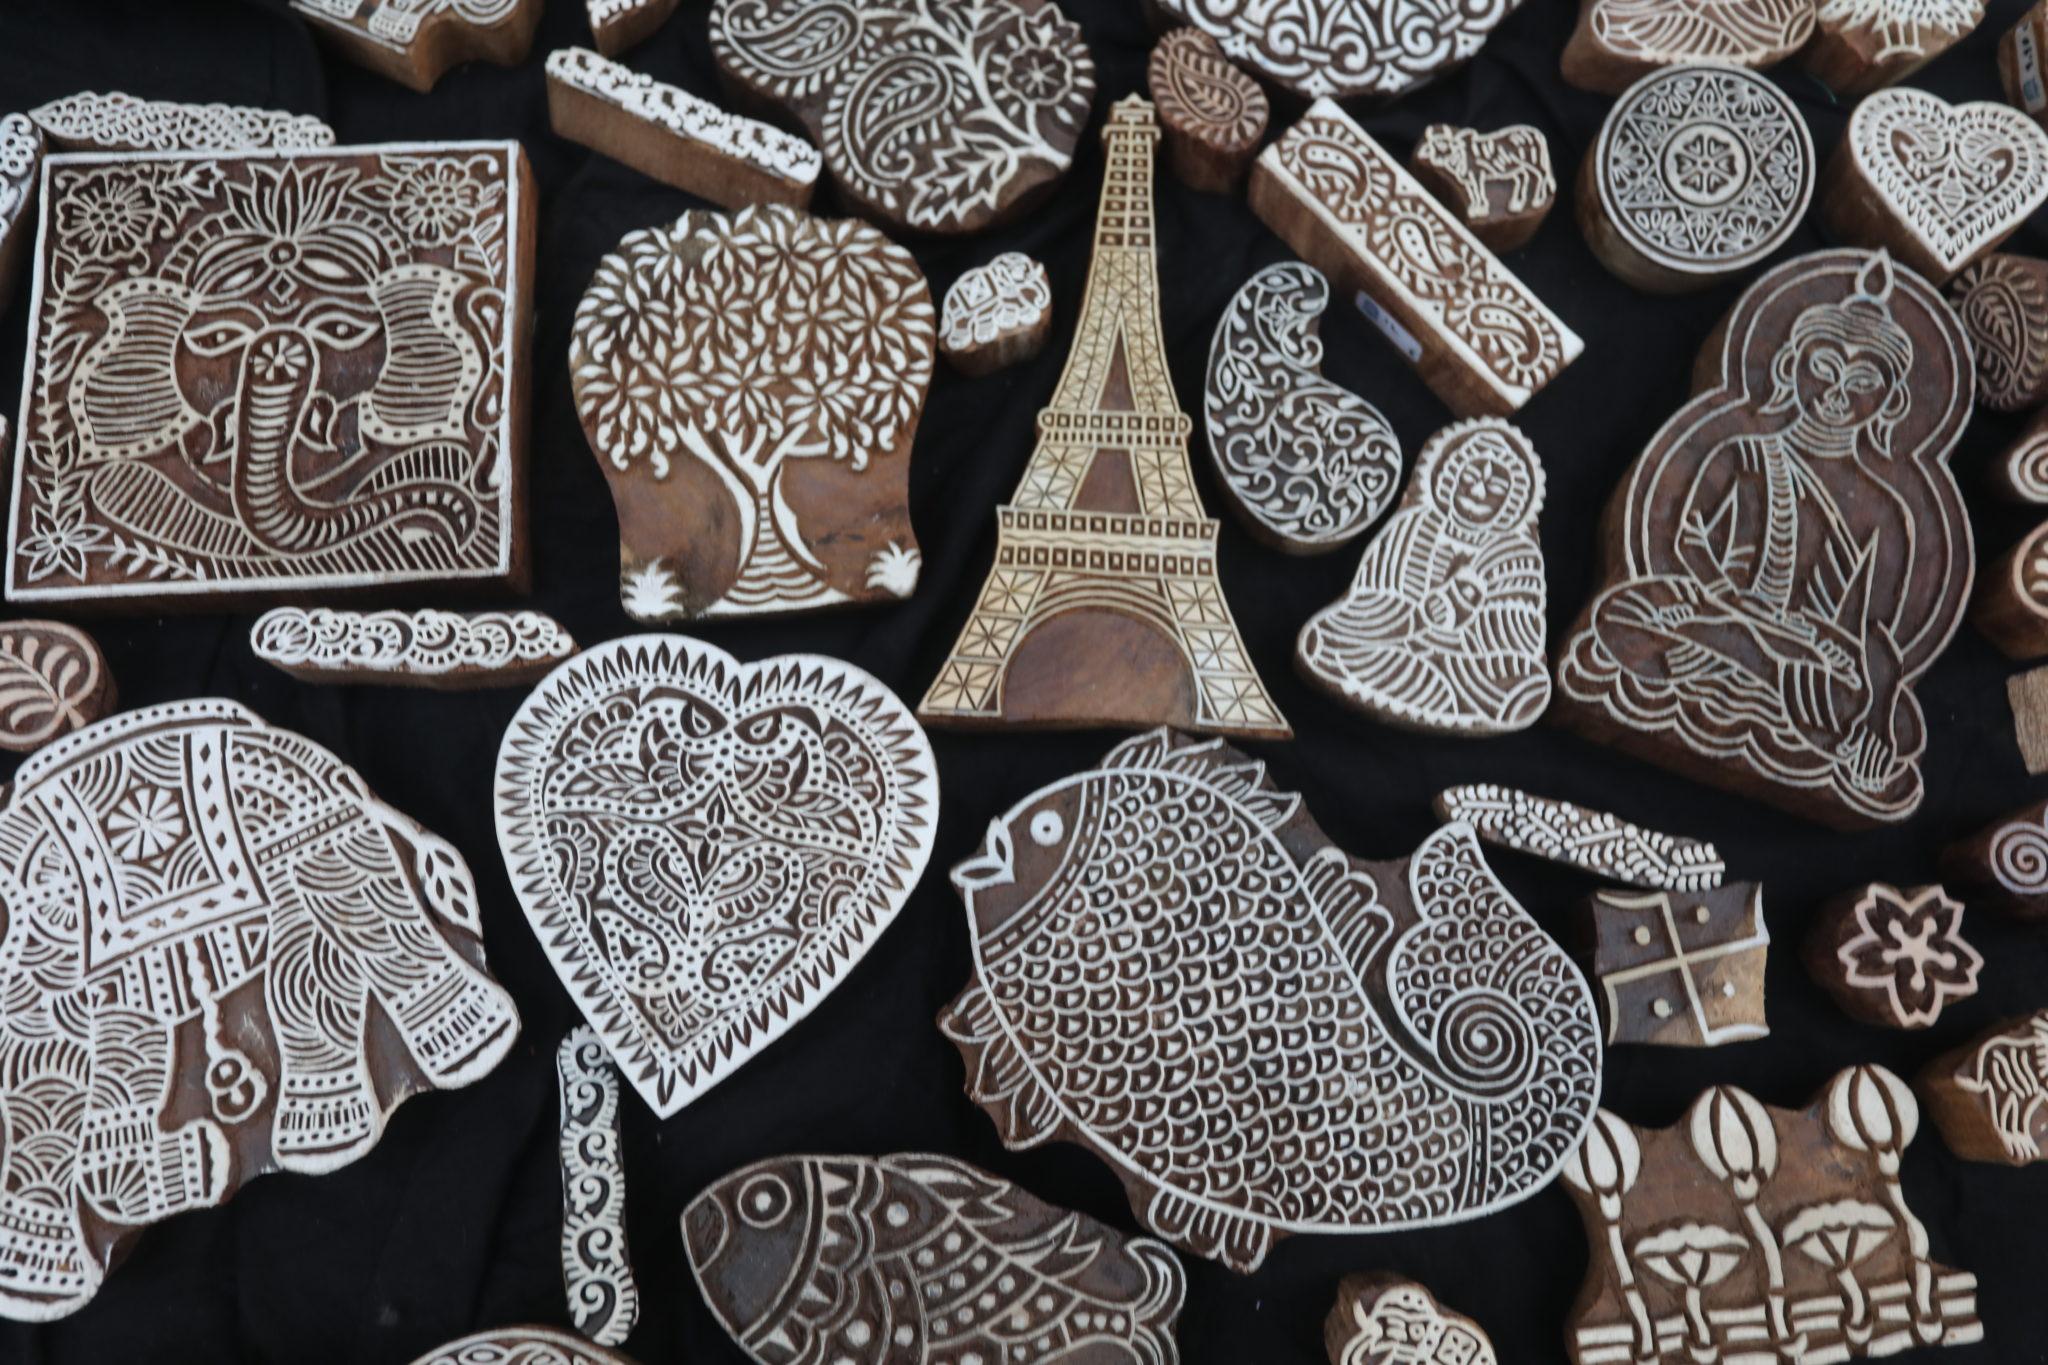 TAMPON TISSU INDIEN ACHAT PARIS block print